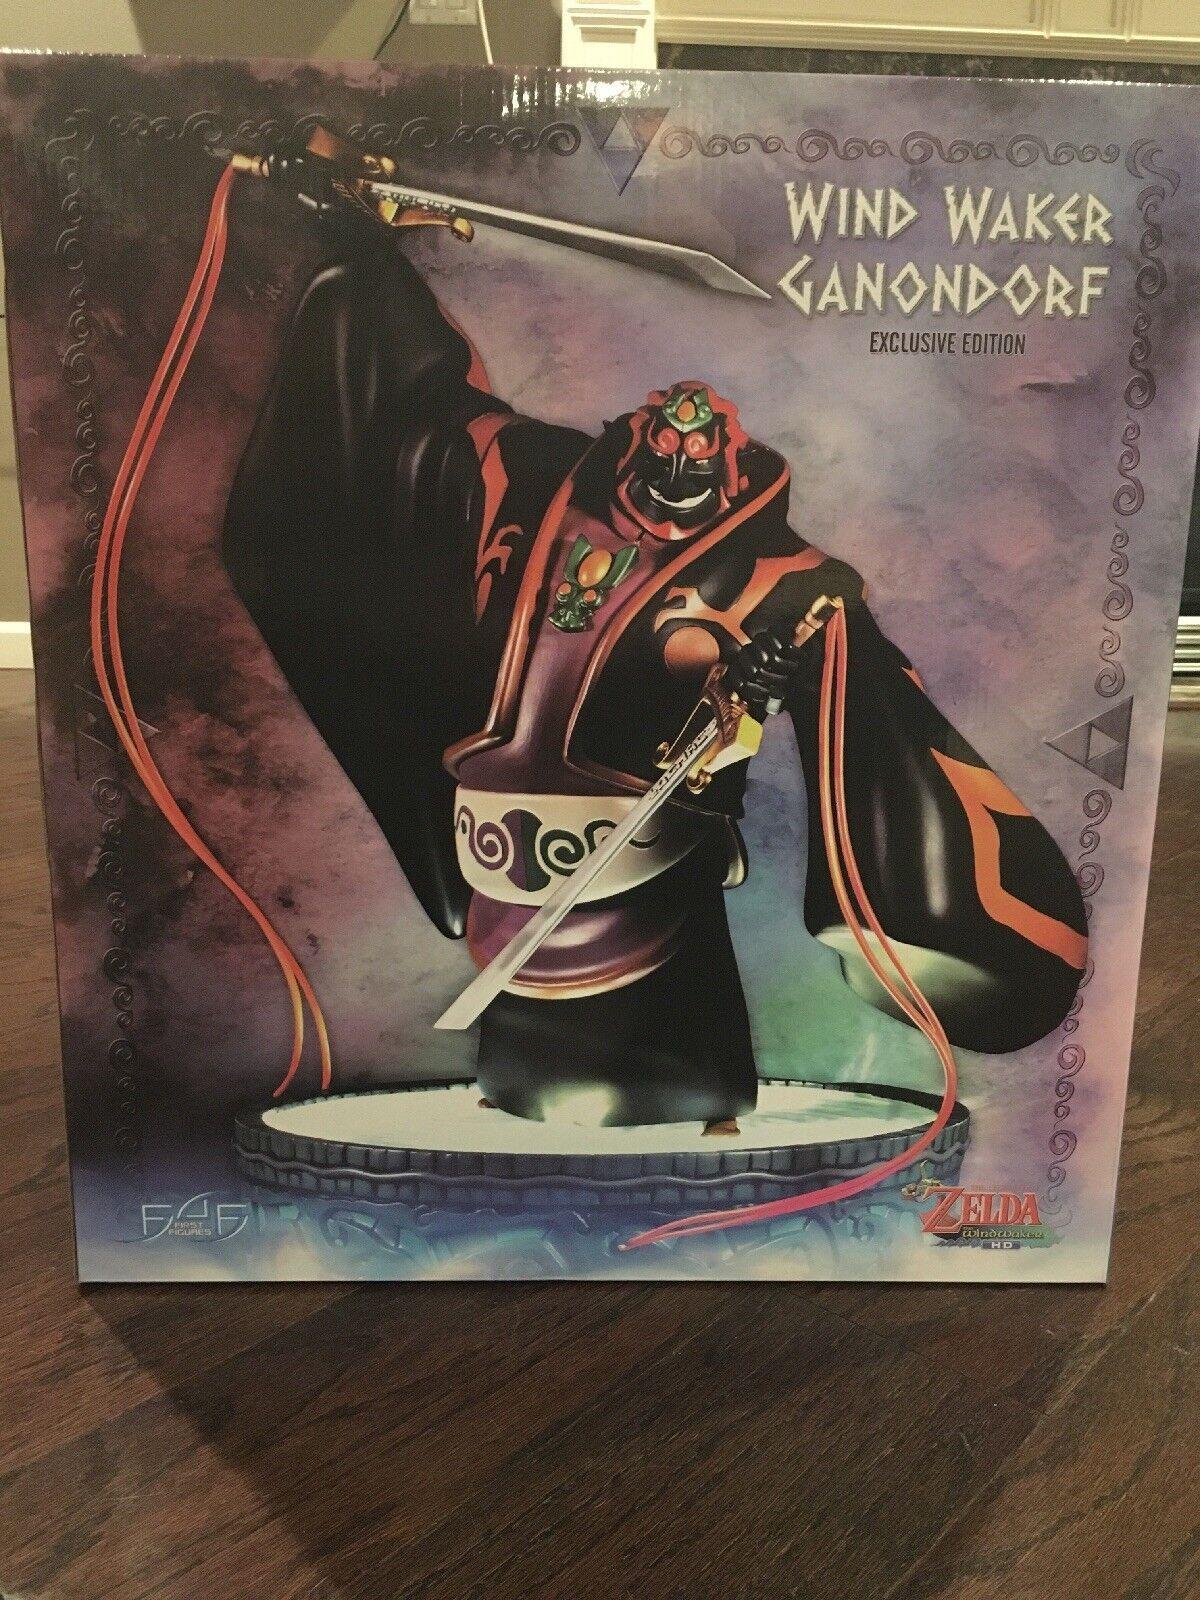 Wind Waker Ganondorf Exclusive Edition